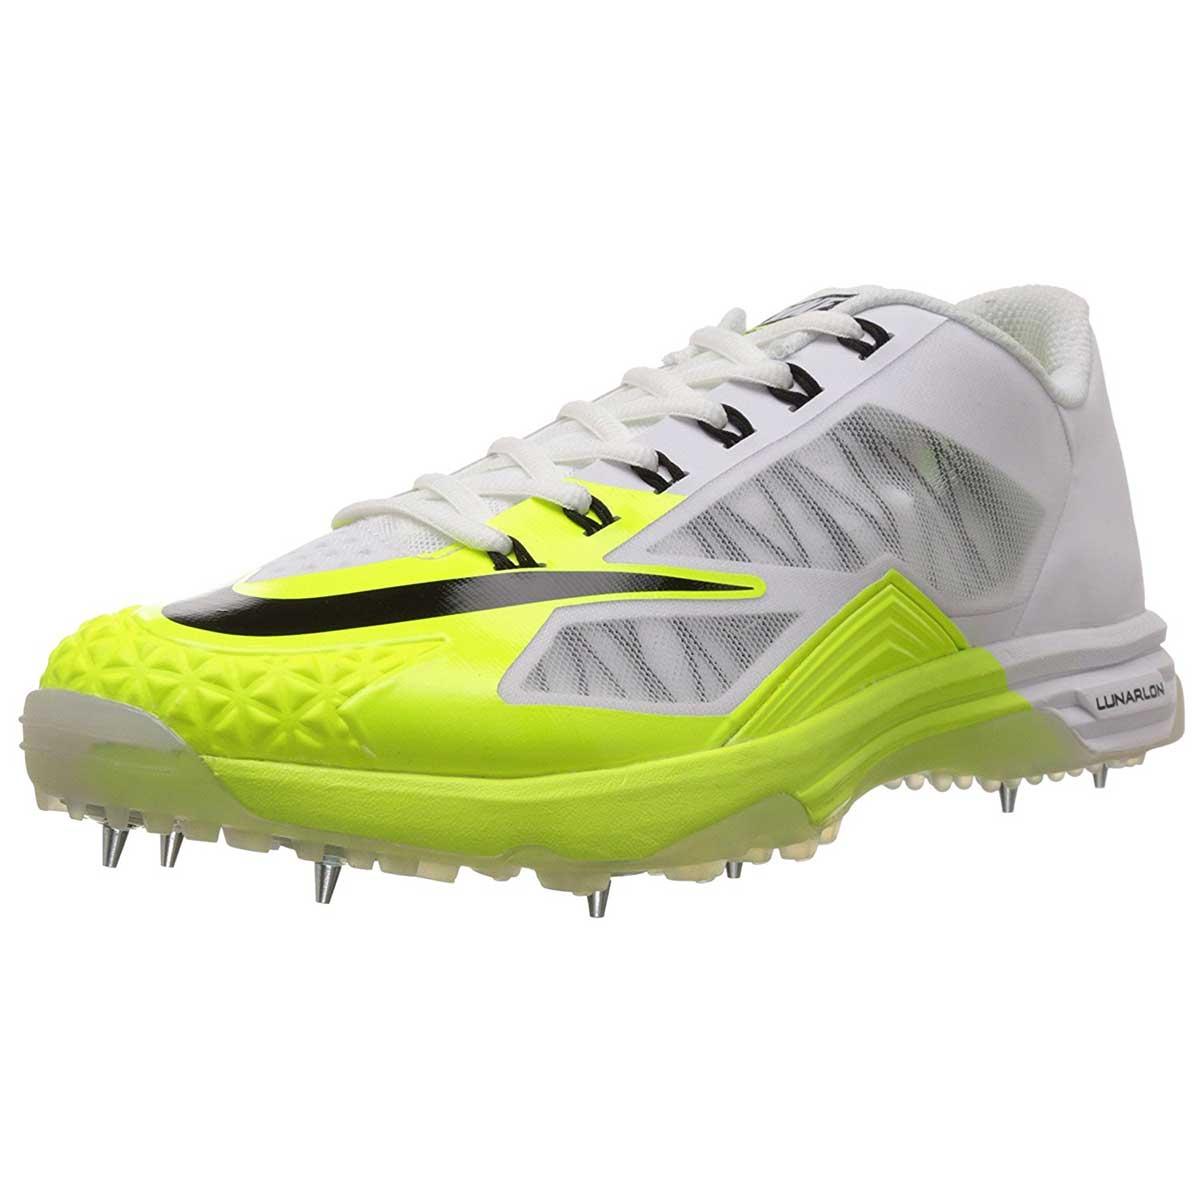 Buy Nike Lunar Dominate 2 Cricket Shoes